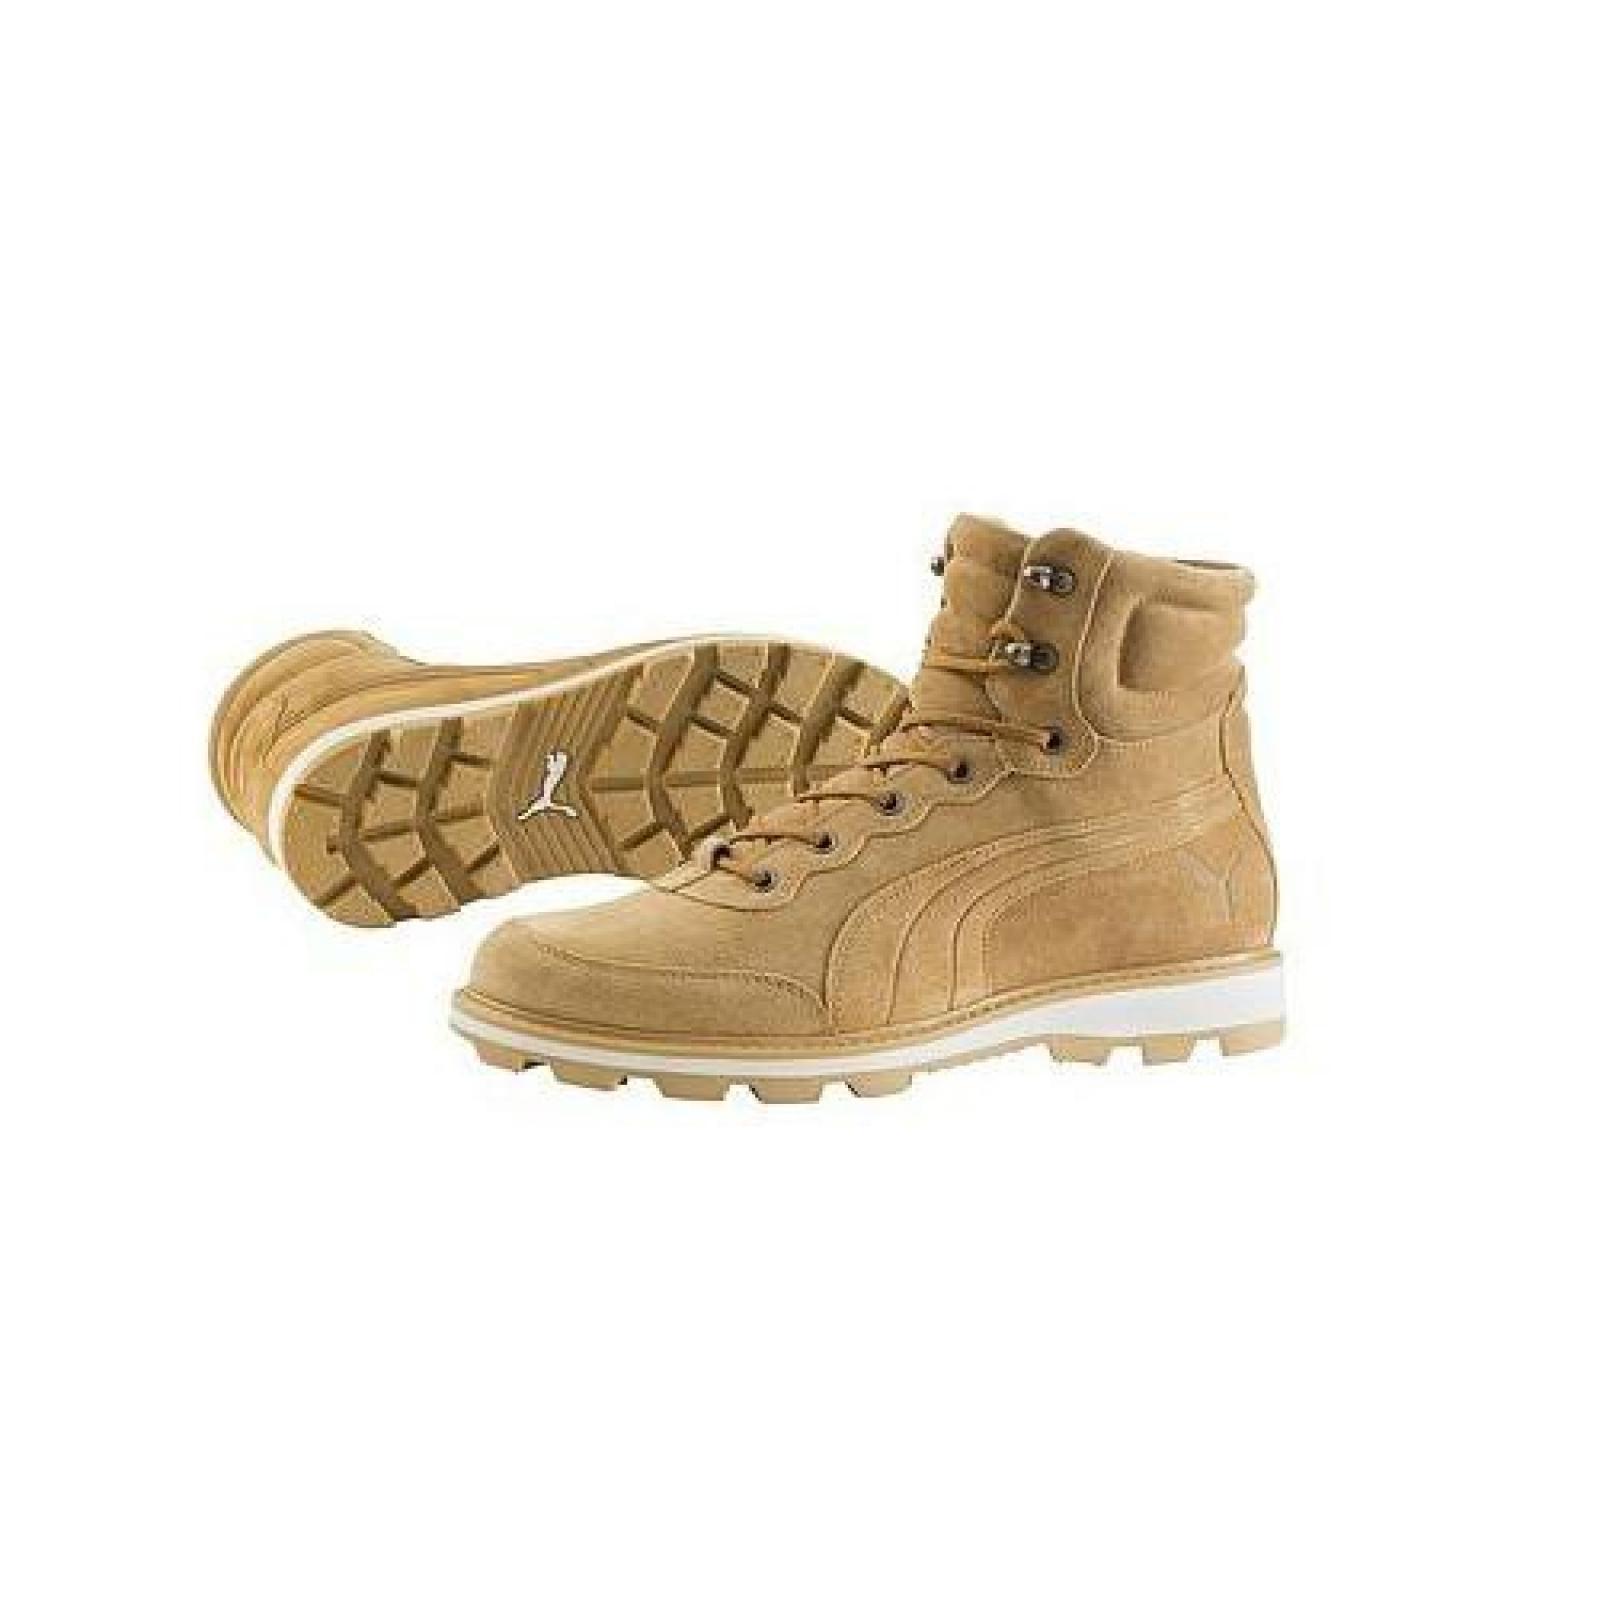 Puma Herren Schuhe Leder Boots Stiefel Winterschuhe DESIERTO BRIA cashew